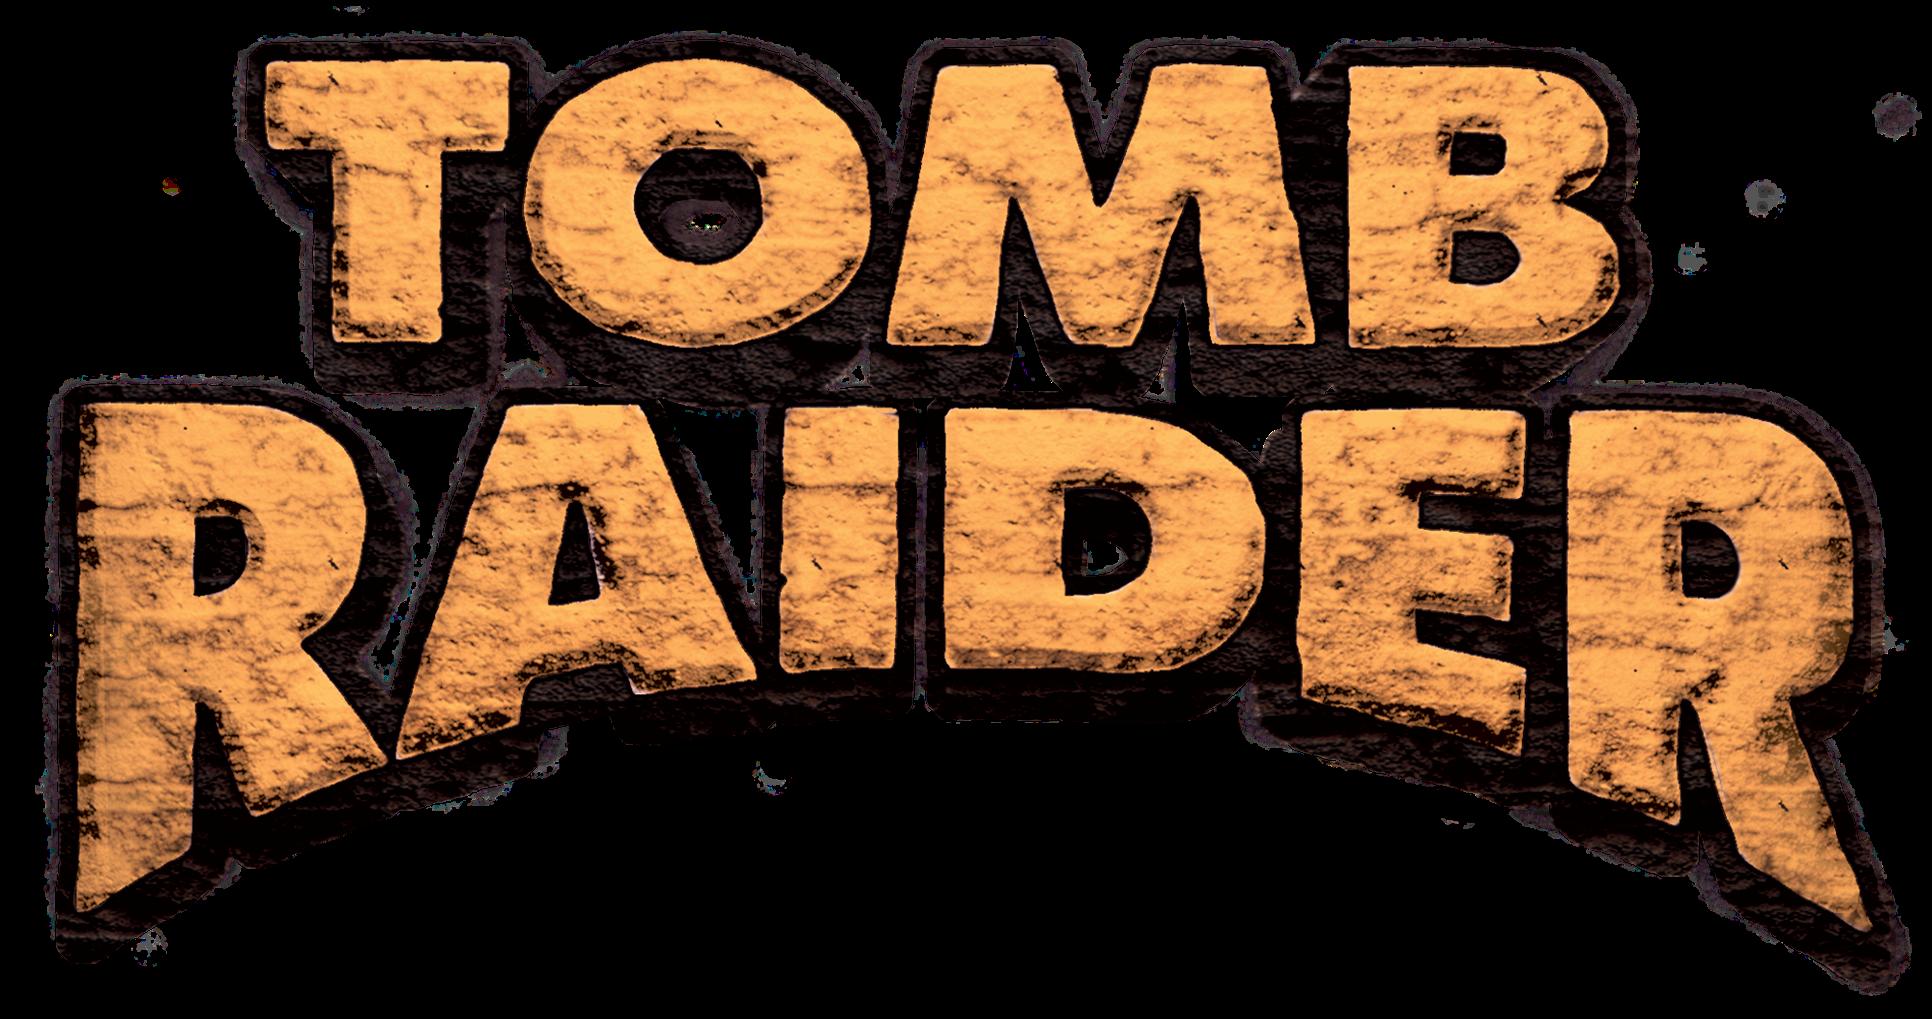 Tomb Raider Logo Google Search Tomb Raider Tomb Raider Video Game Tomb Raider Game